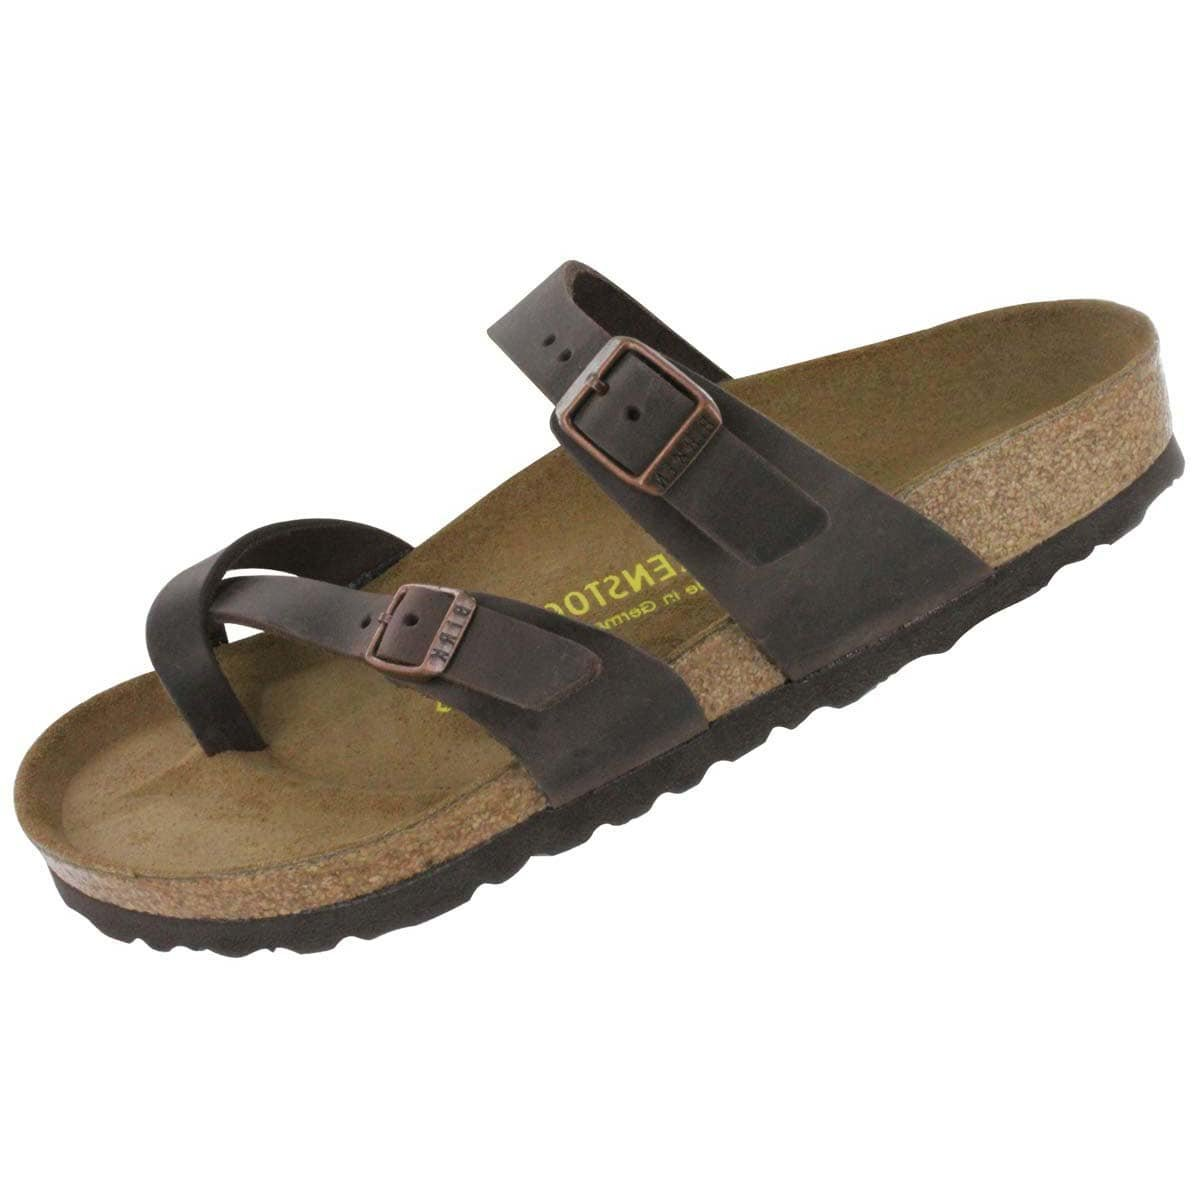 Birkenstock Women's Mayari Adjustable Toe Loop Cork Footbed Sandal Havana 36 M EU